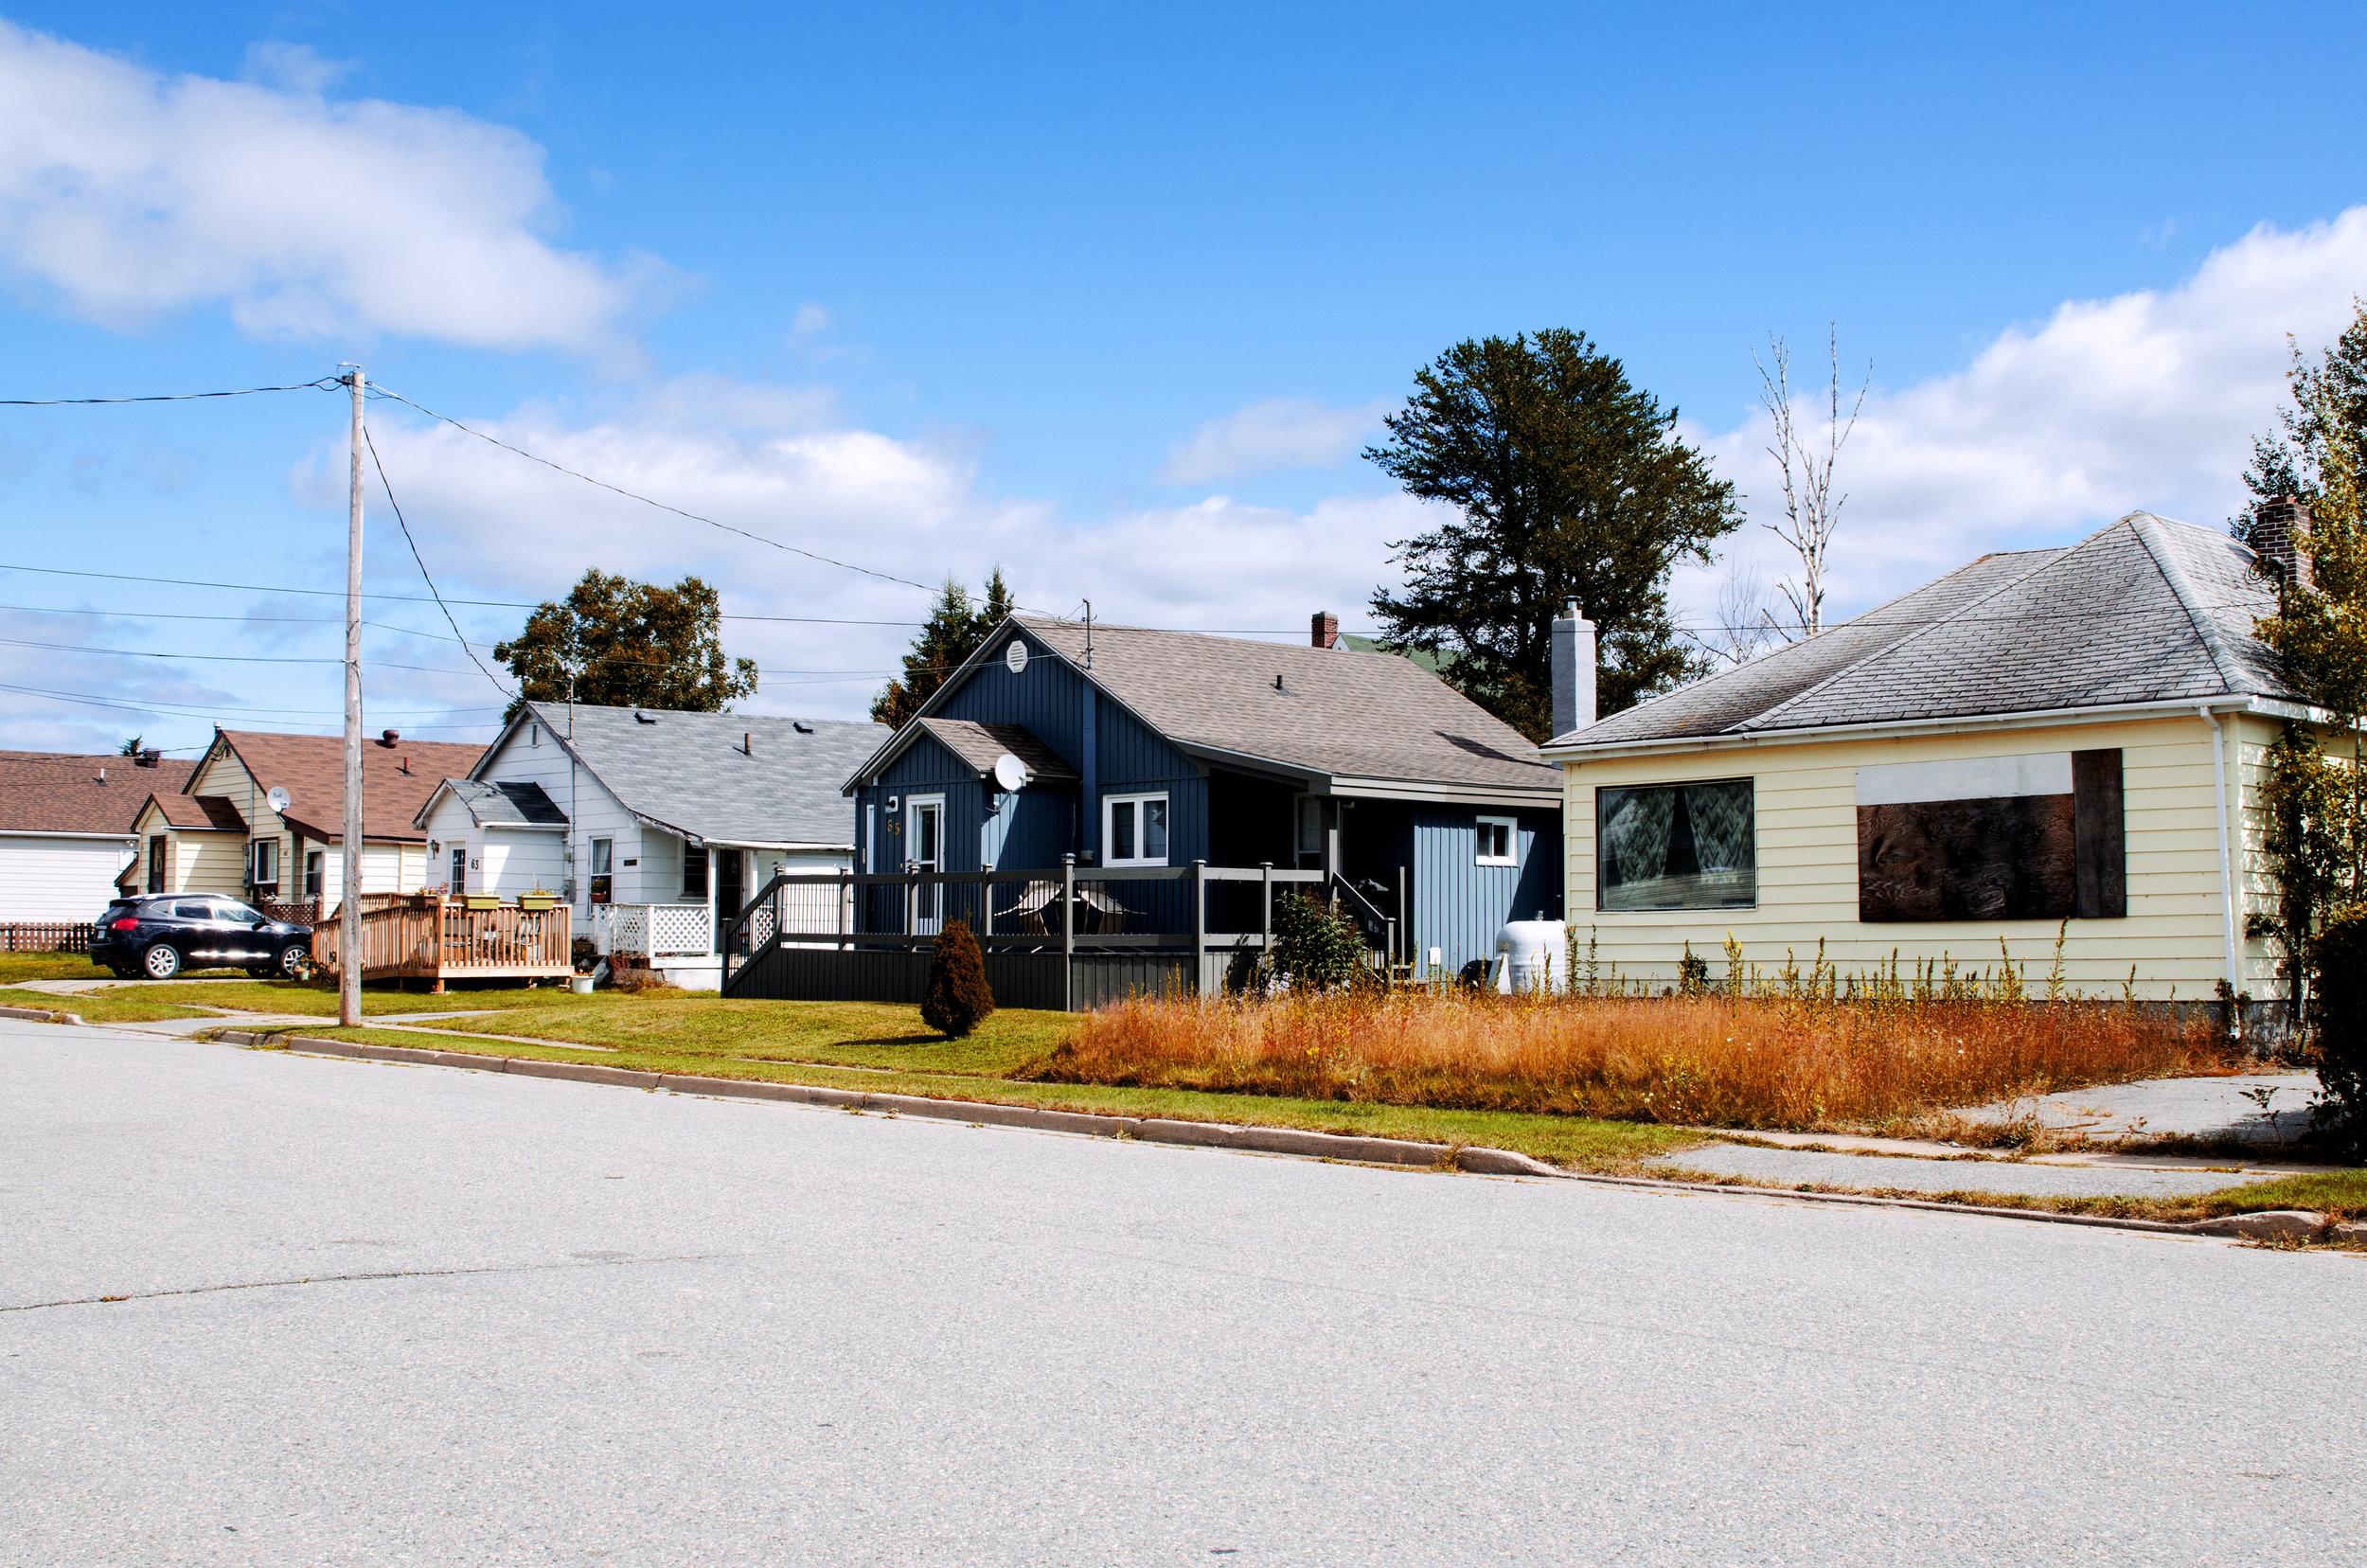 Jenkins, Cheyenne. Neighbourhood. 2017. Digital Photography. Wawa, Ontario